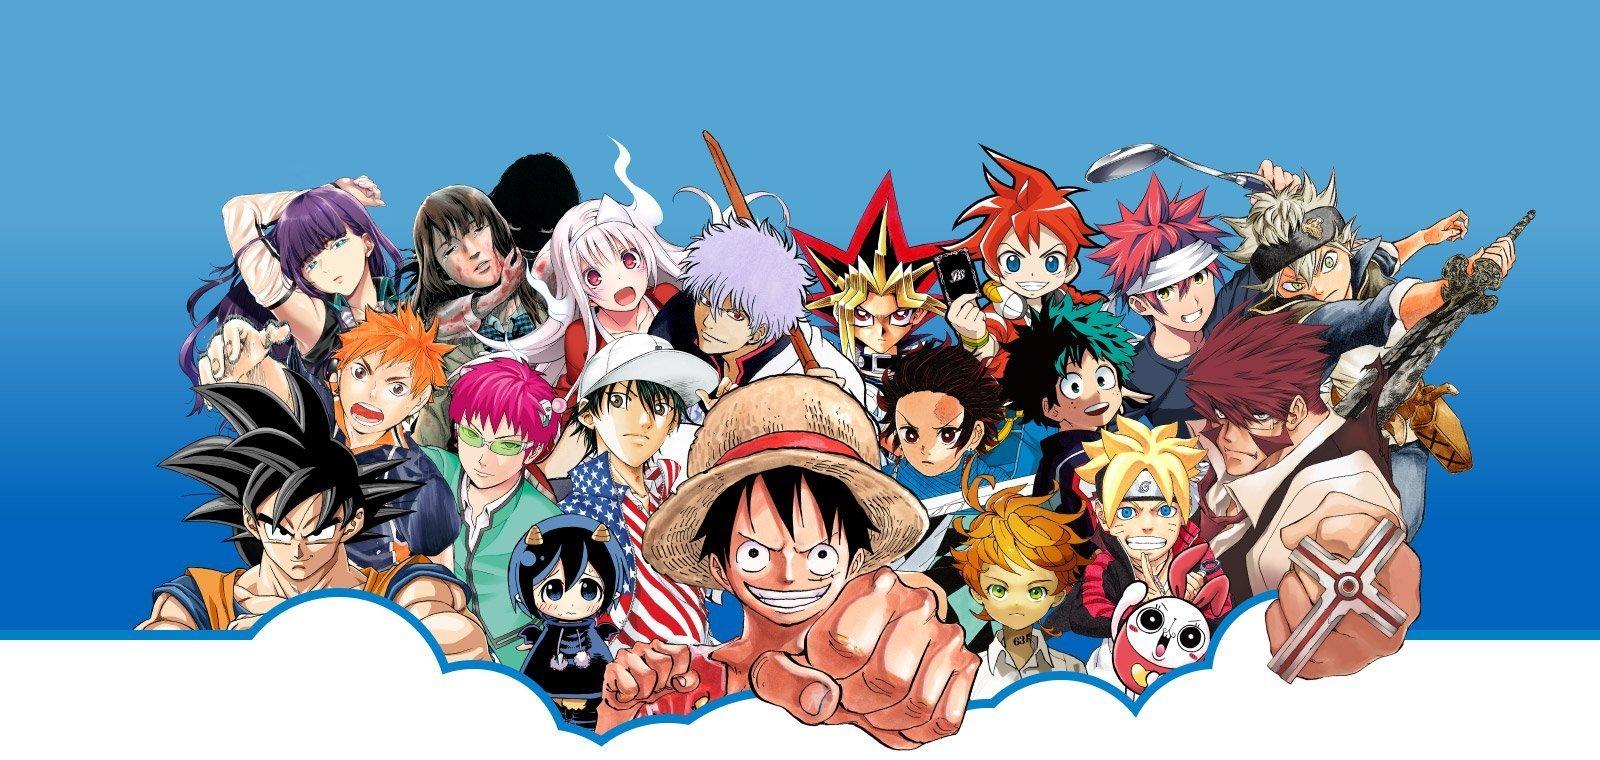 One Piece alla Jump Festa 2018 | One Piece Mania